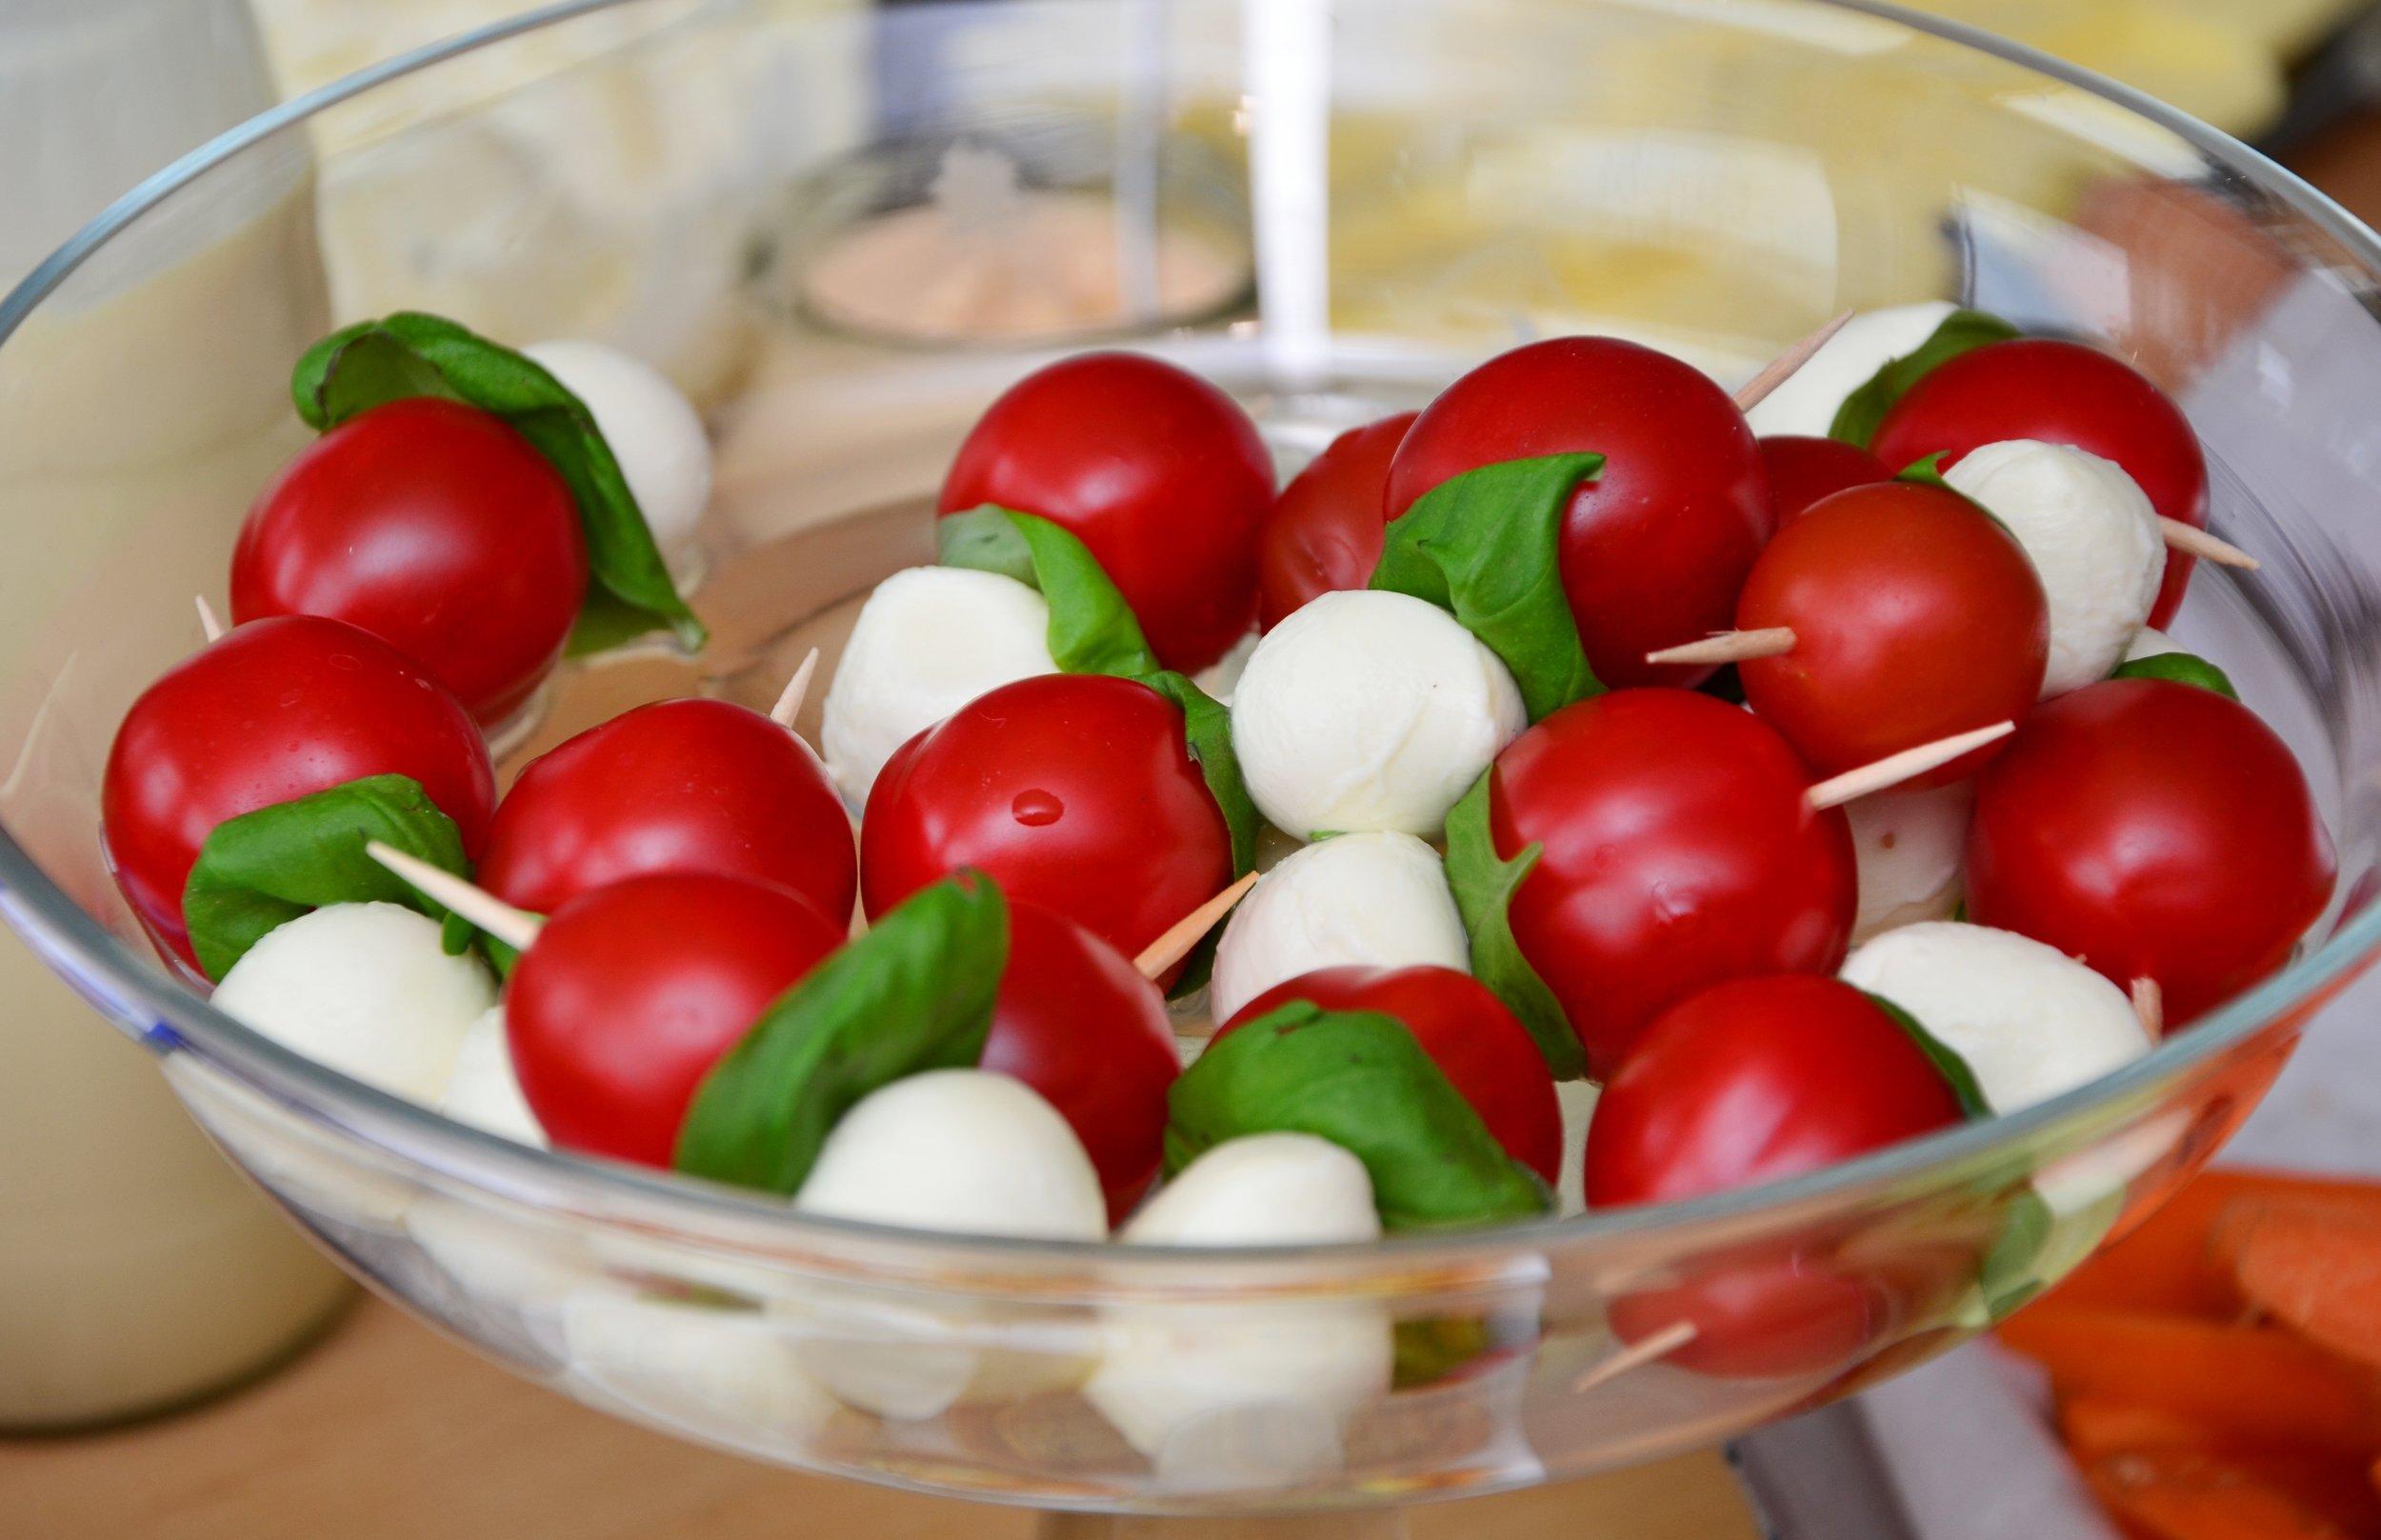 tomato-mozzarella-cocktailtomaten-mozarella-snack-38030.jpeg